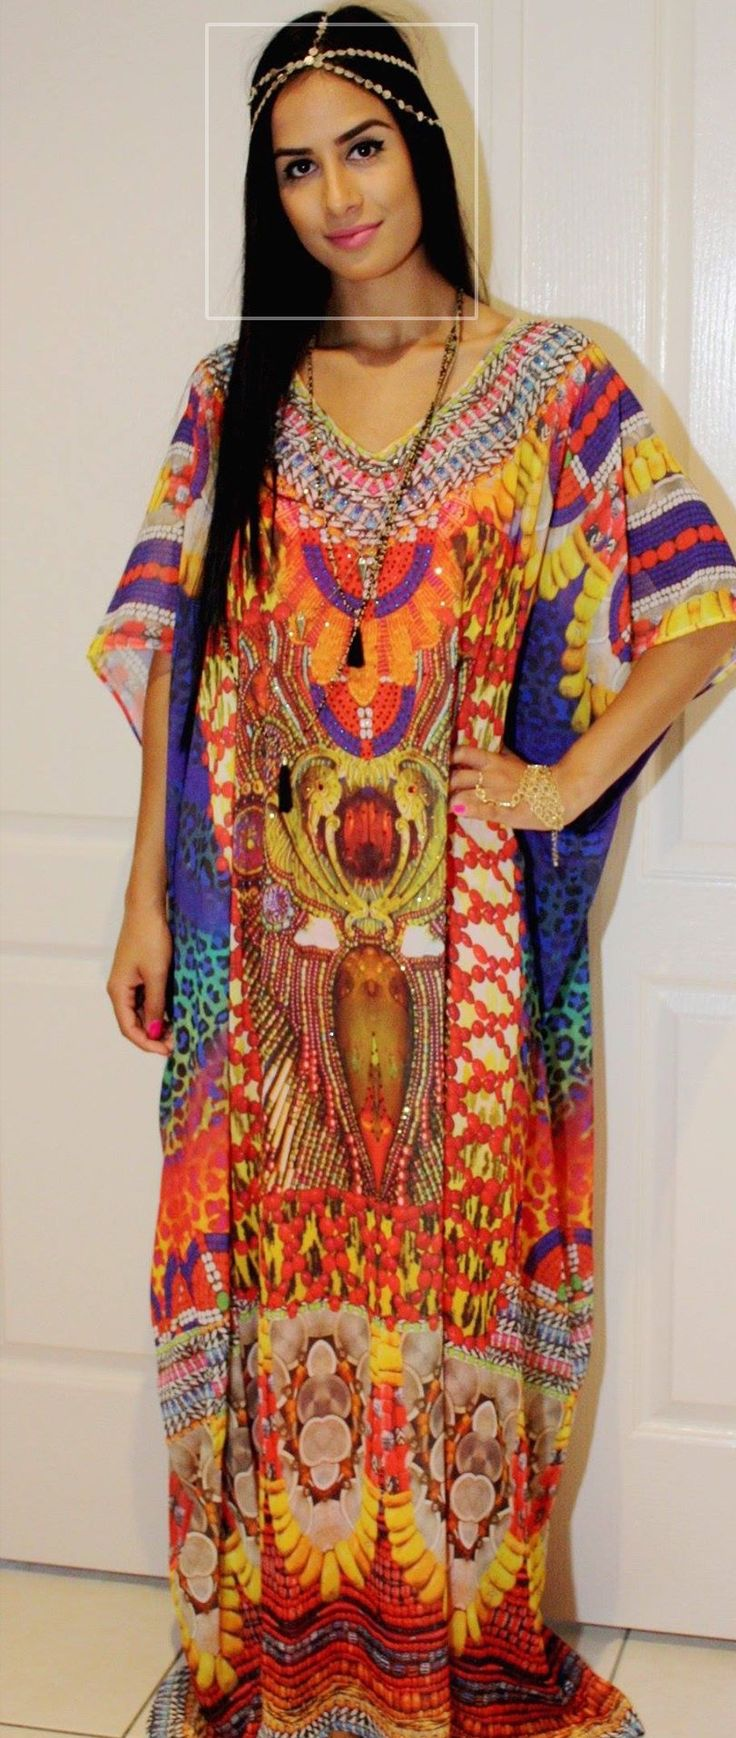 www.kFtanallure.com Designer look tribal kaftans